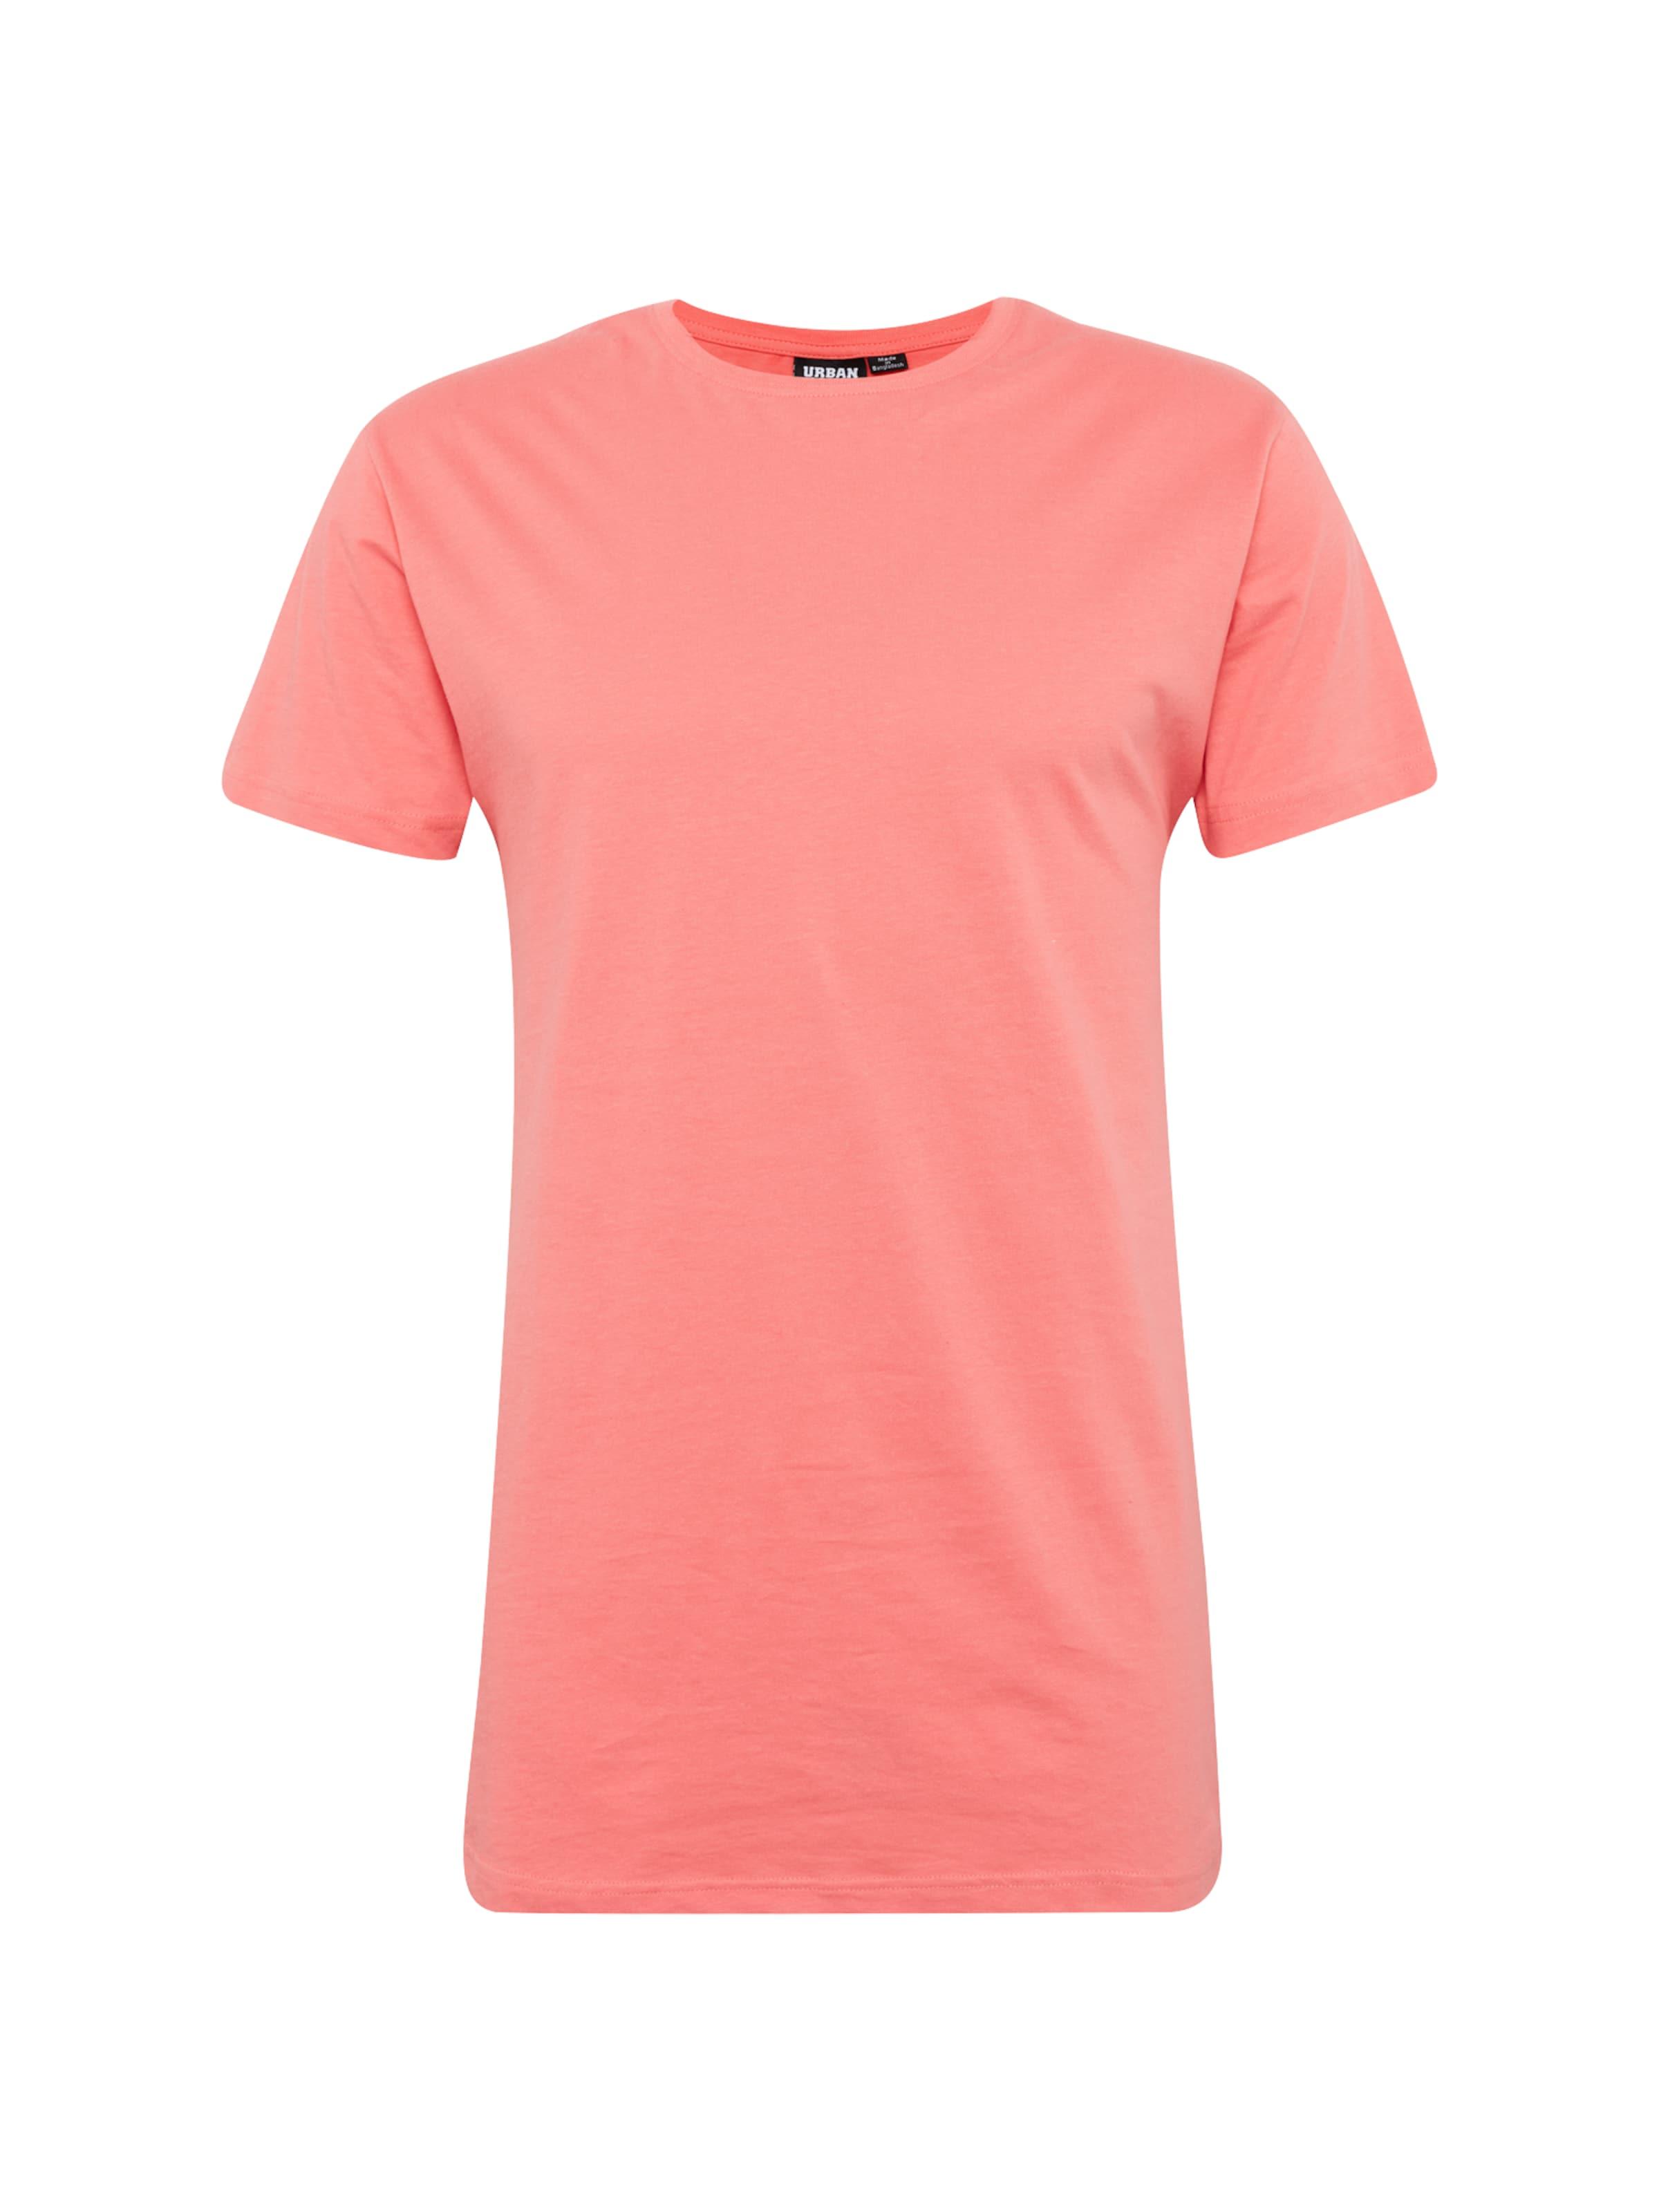 Koralle 'shaped In T Tee' Urban Classics shirt Long nk08wOP